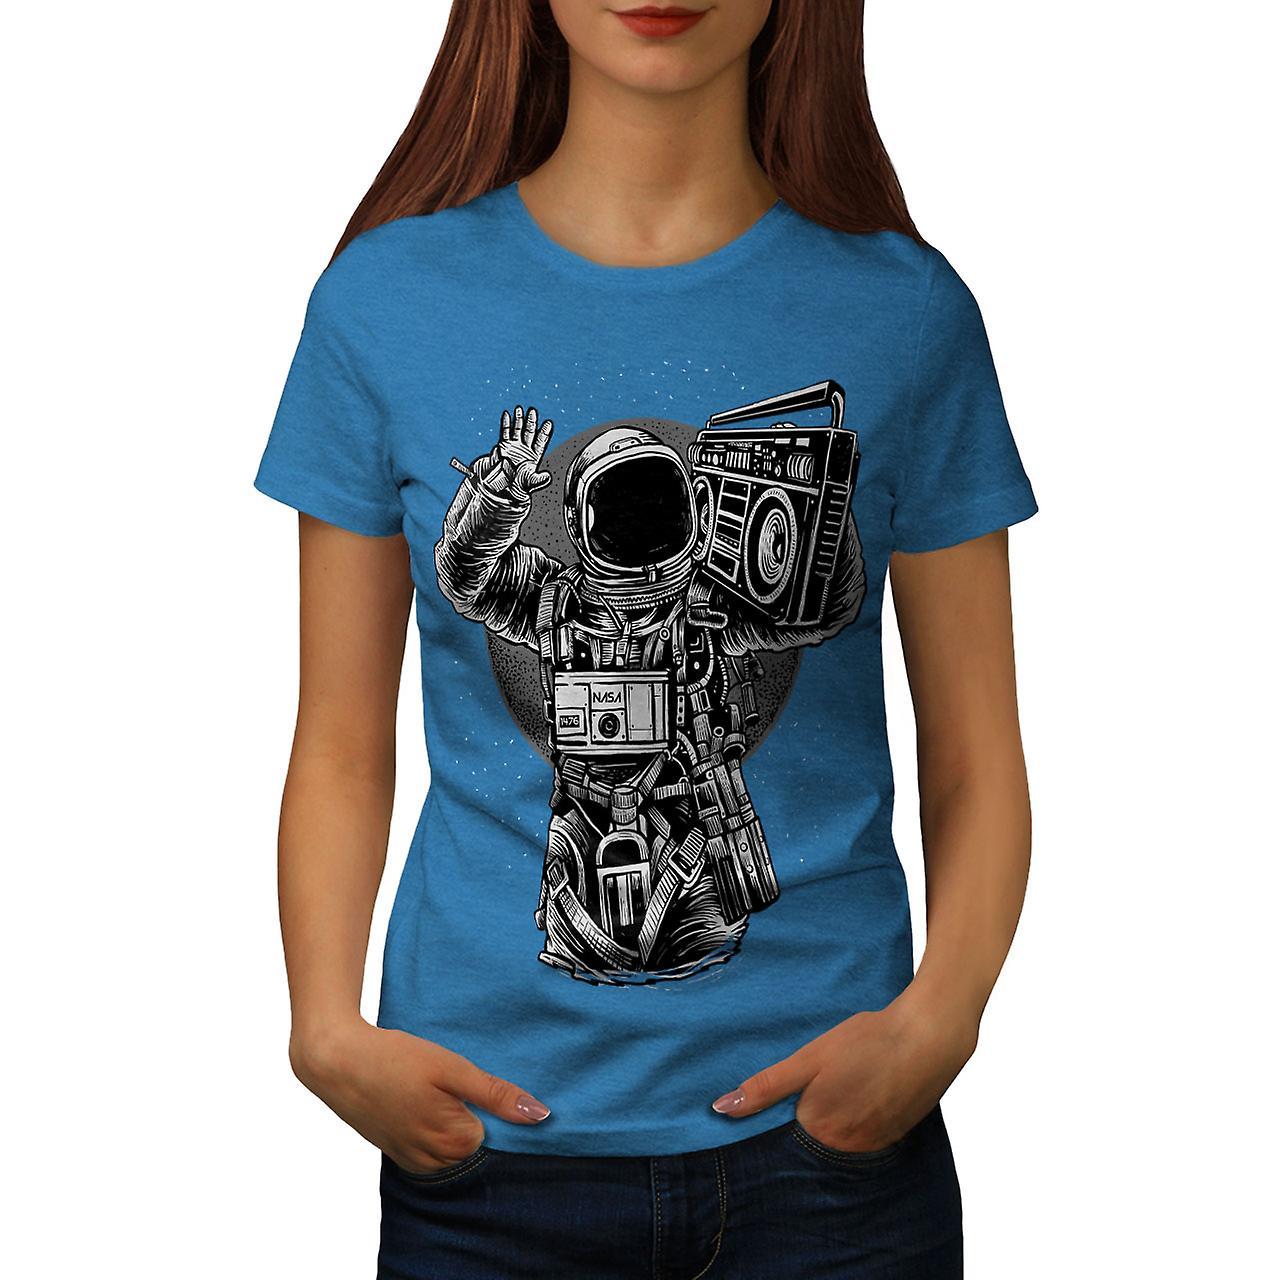 Astronaut Boombox Music Women Royal BlueT-shirt   Wellcoda ...